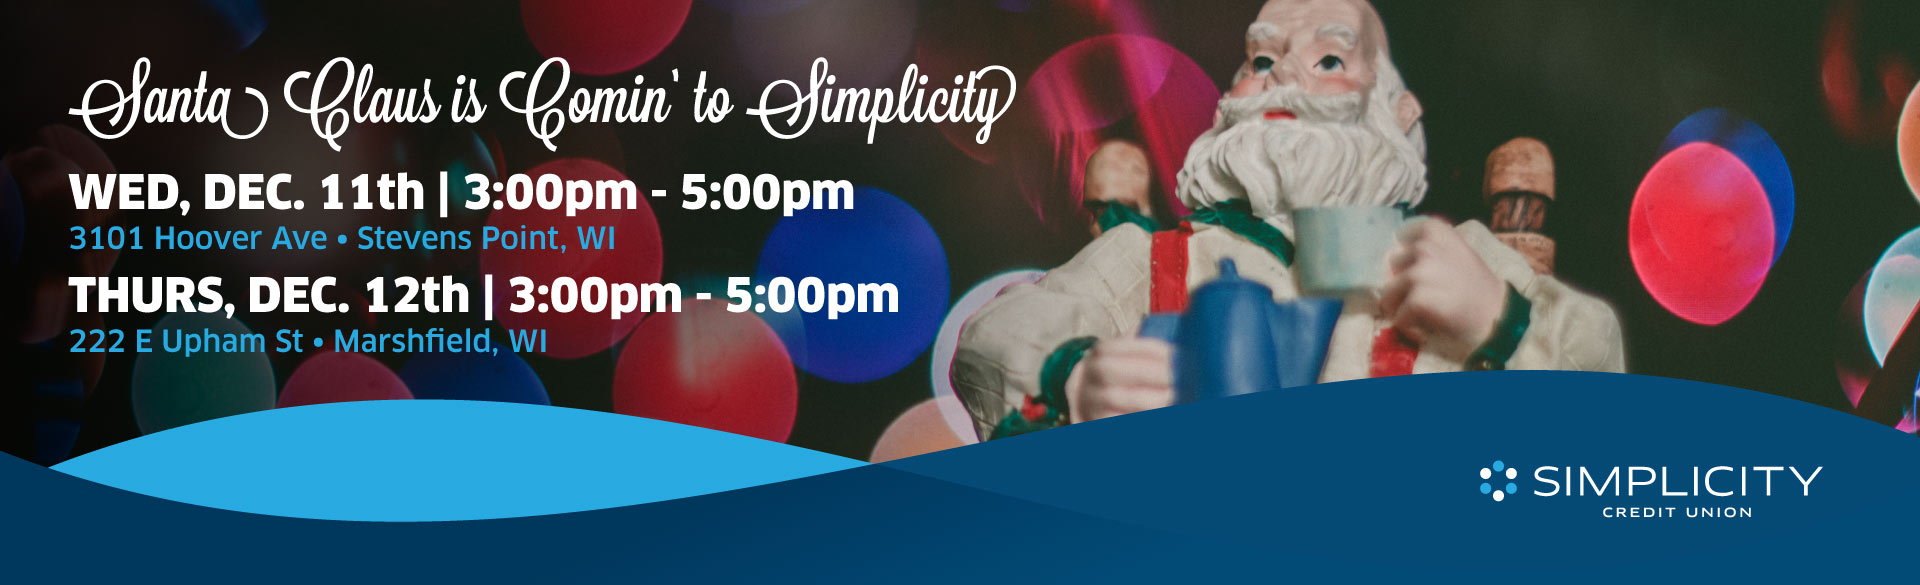 Santa Claus is comin' to Simplicity!